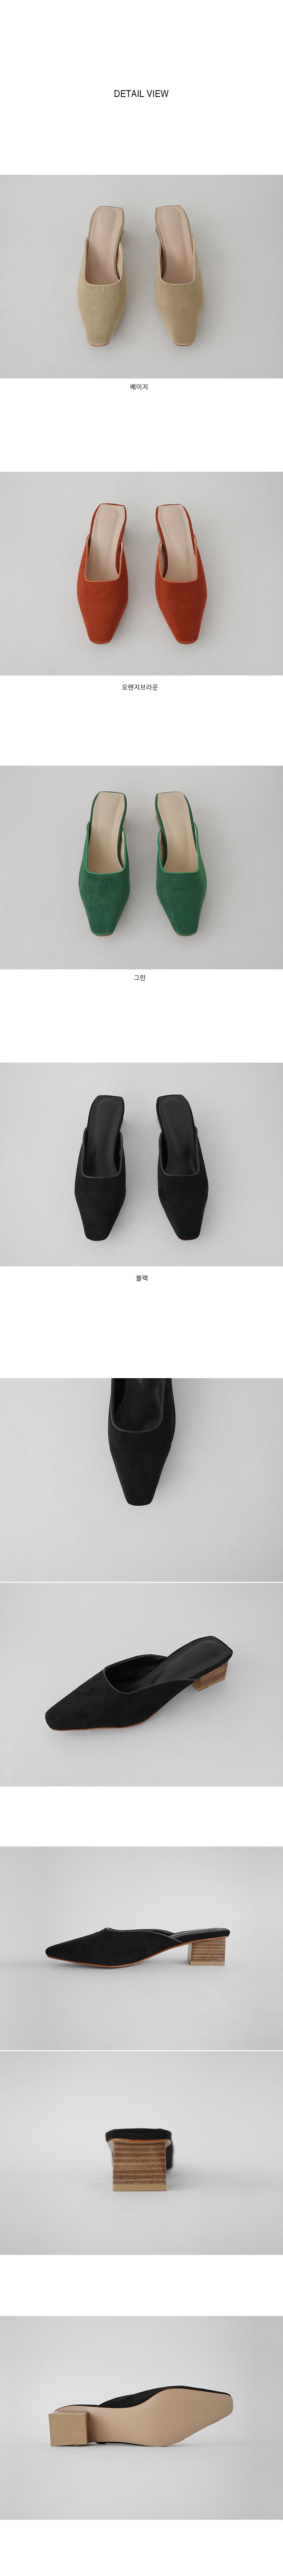 suede middle wood heel